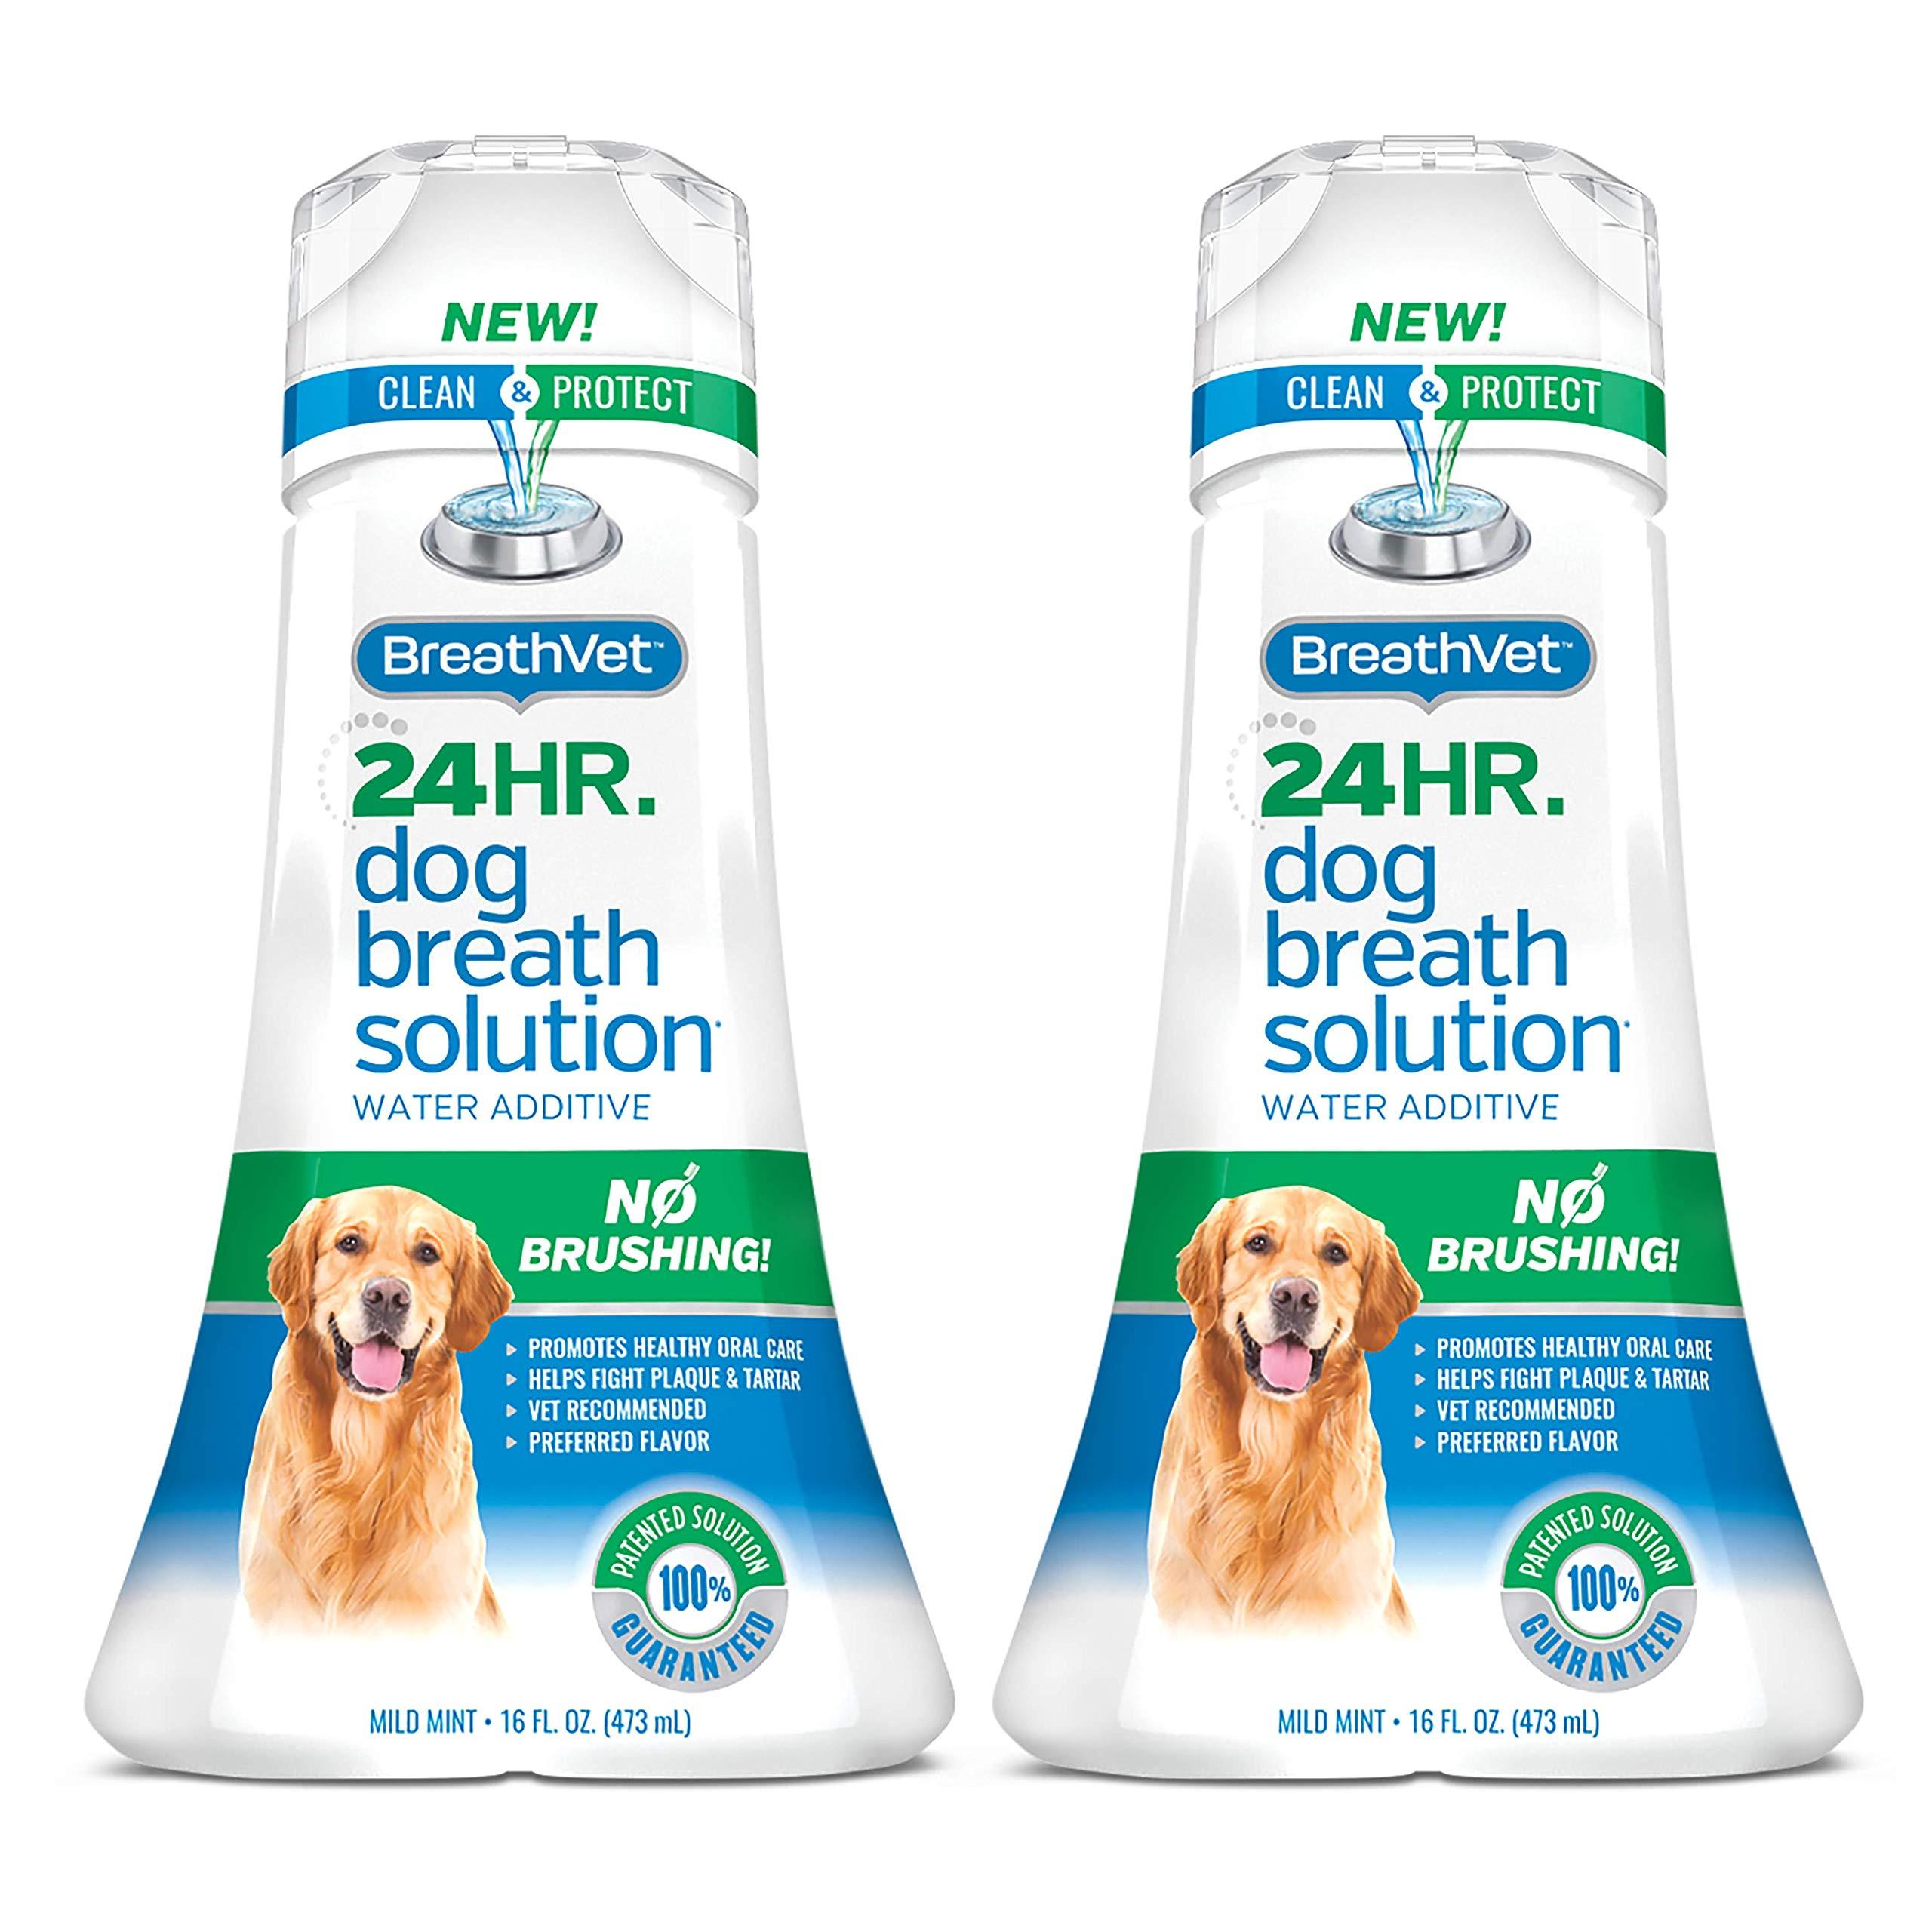 BreathVet Dog Mouthwash Water Additive - Fights Plaque and Tartar - 24HR Bad Dog Breath Solution - 16 oz - 2-Pack by BreathVet